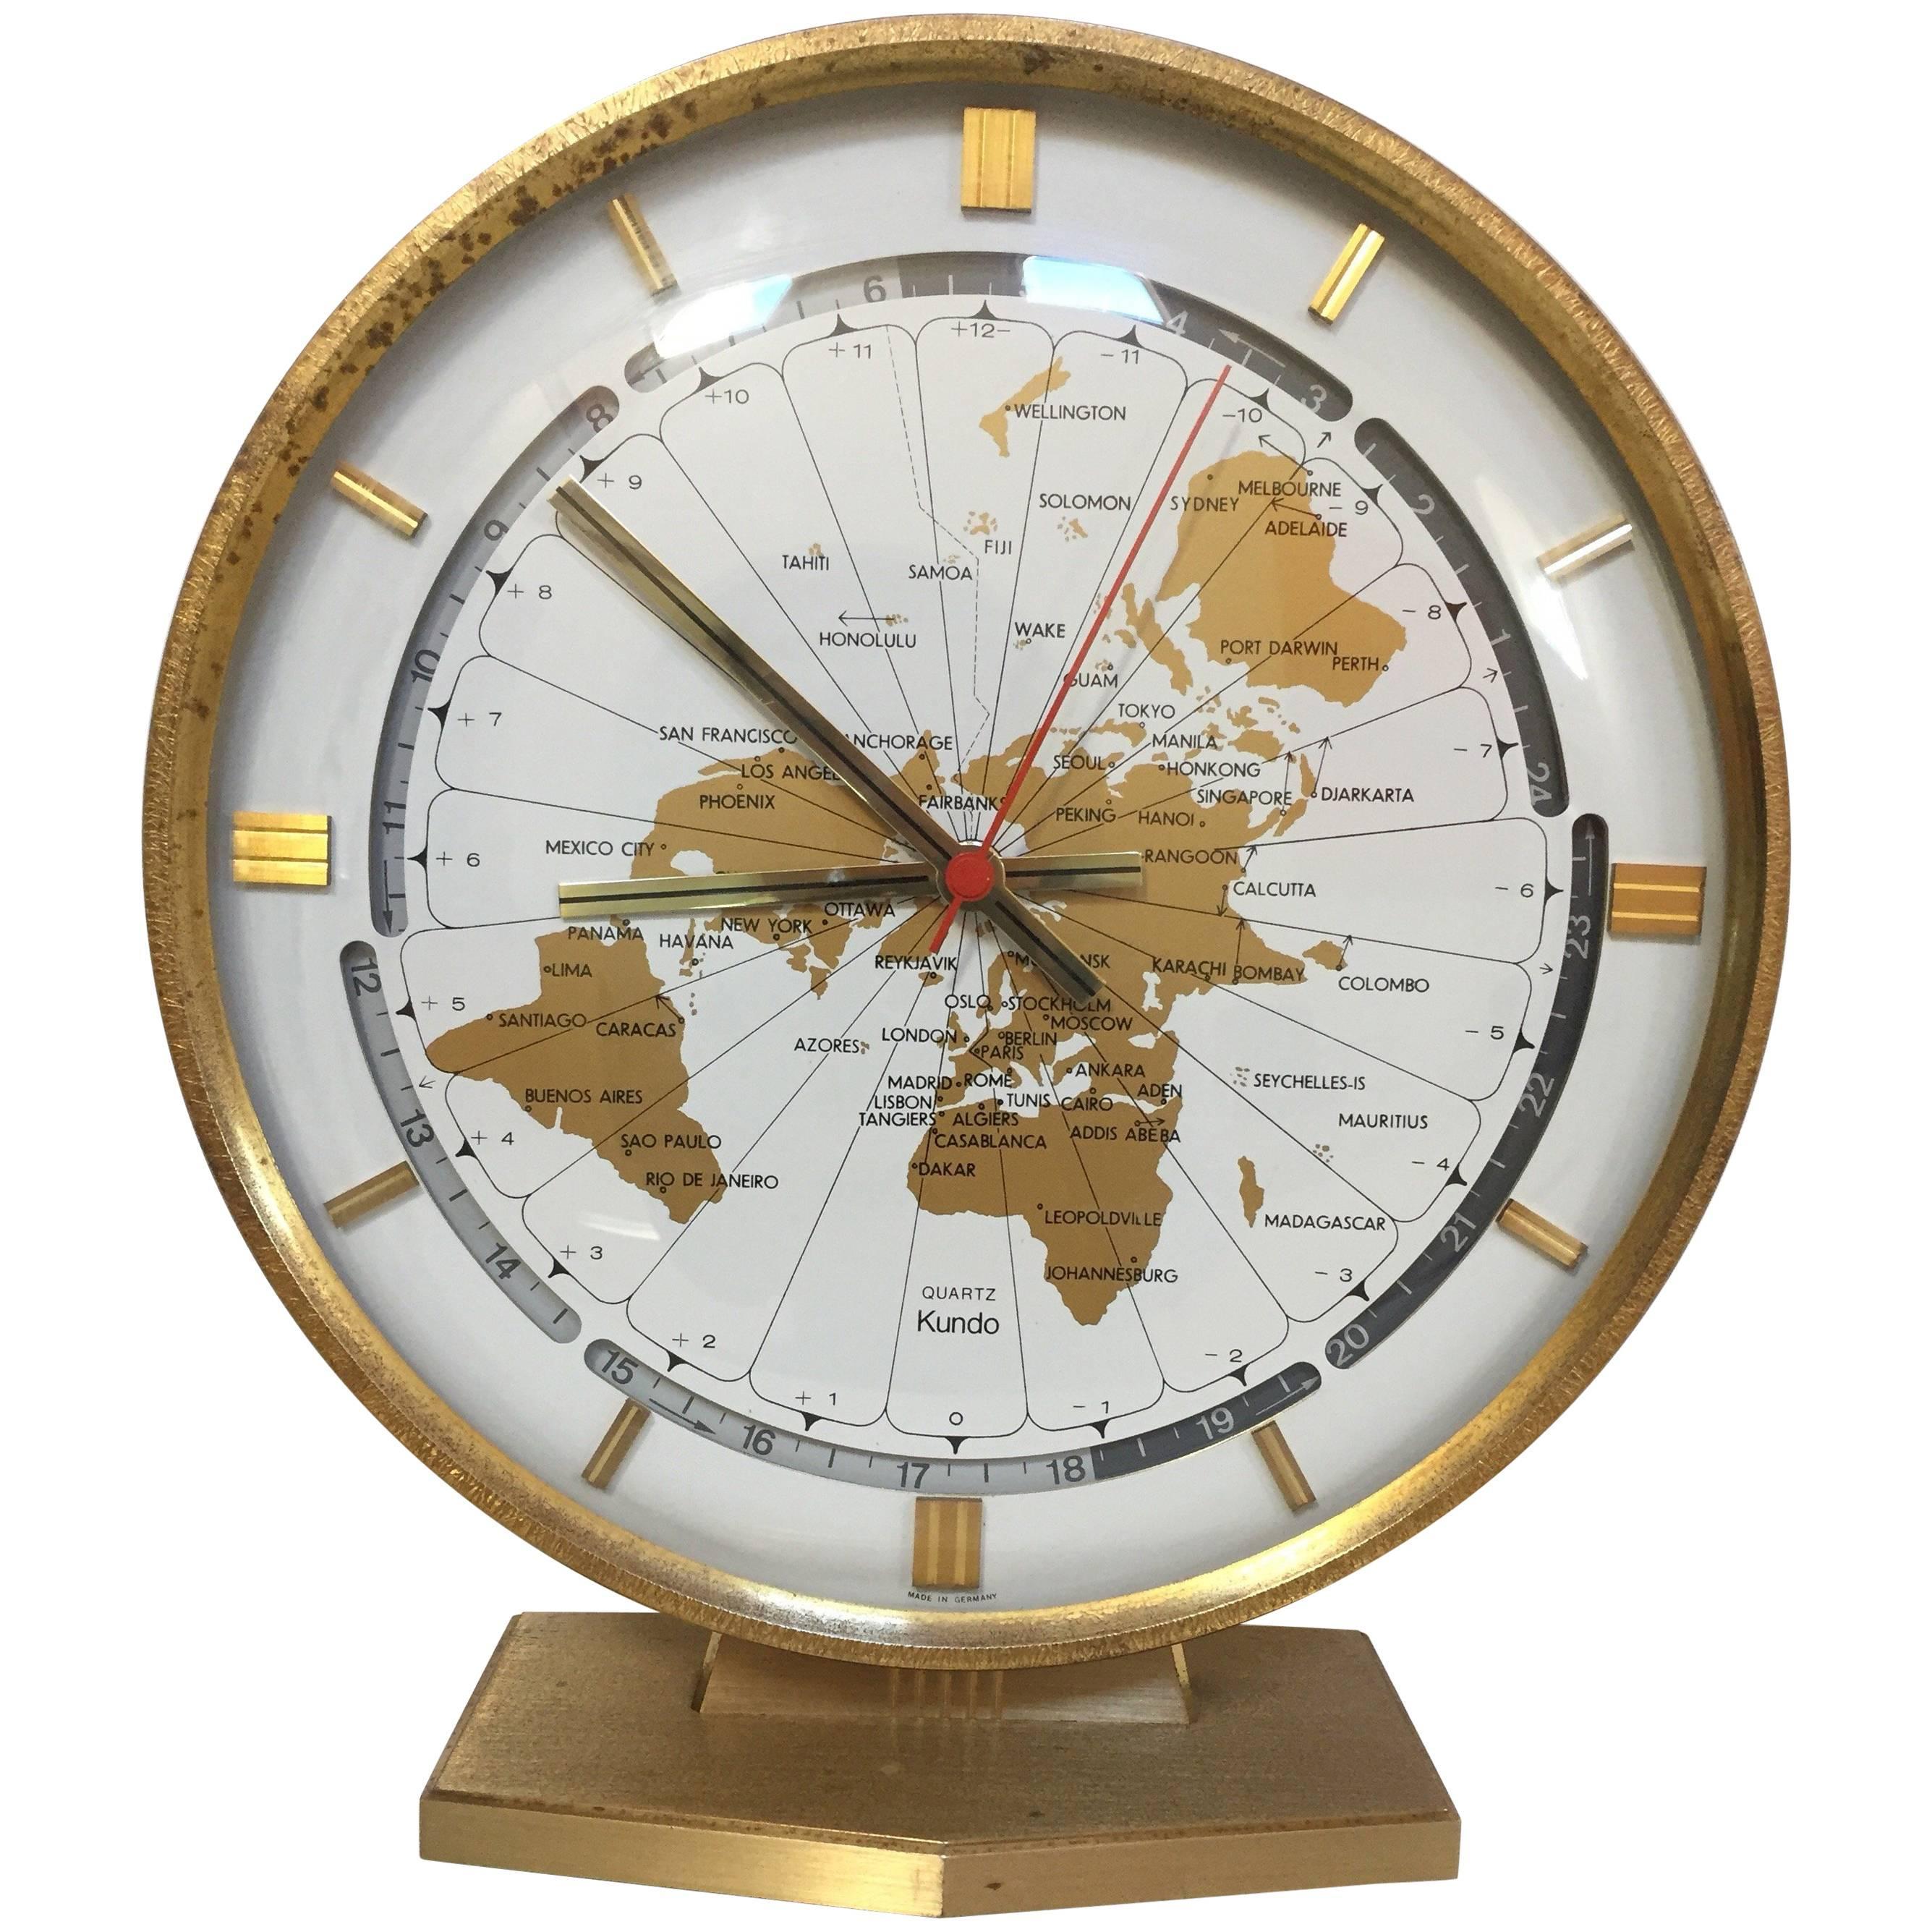 Modernist Desk World Clock Kundo by Kieninger & Obergfell West Germany 1960s